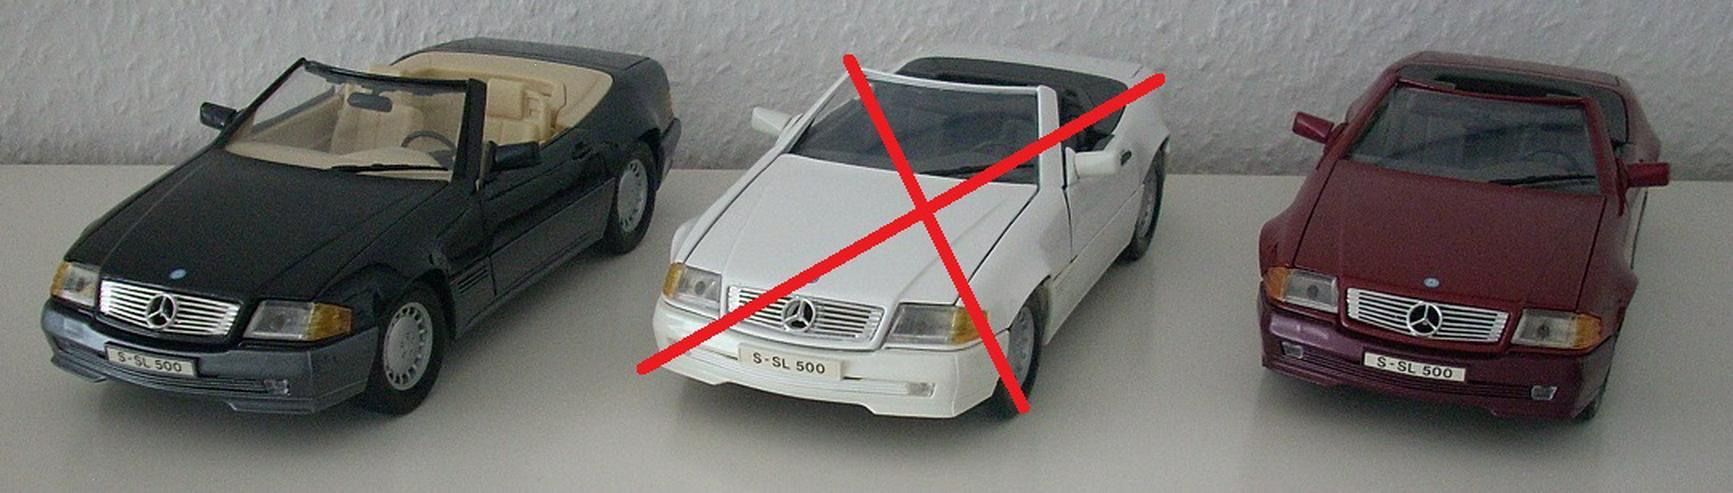 Mercedes 500 SL (1989) - schwarz / bordeauxrot - Modellauto 1:18 - MAISTO - Modellautos & Nutzfahrzeuge - Bild 1